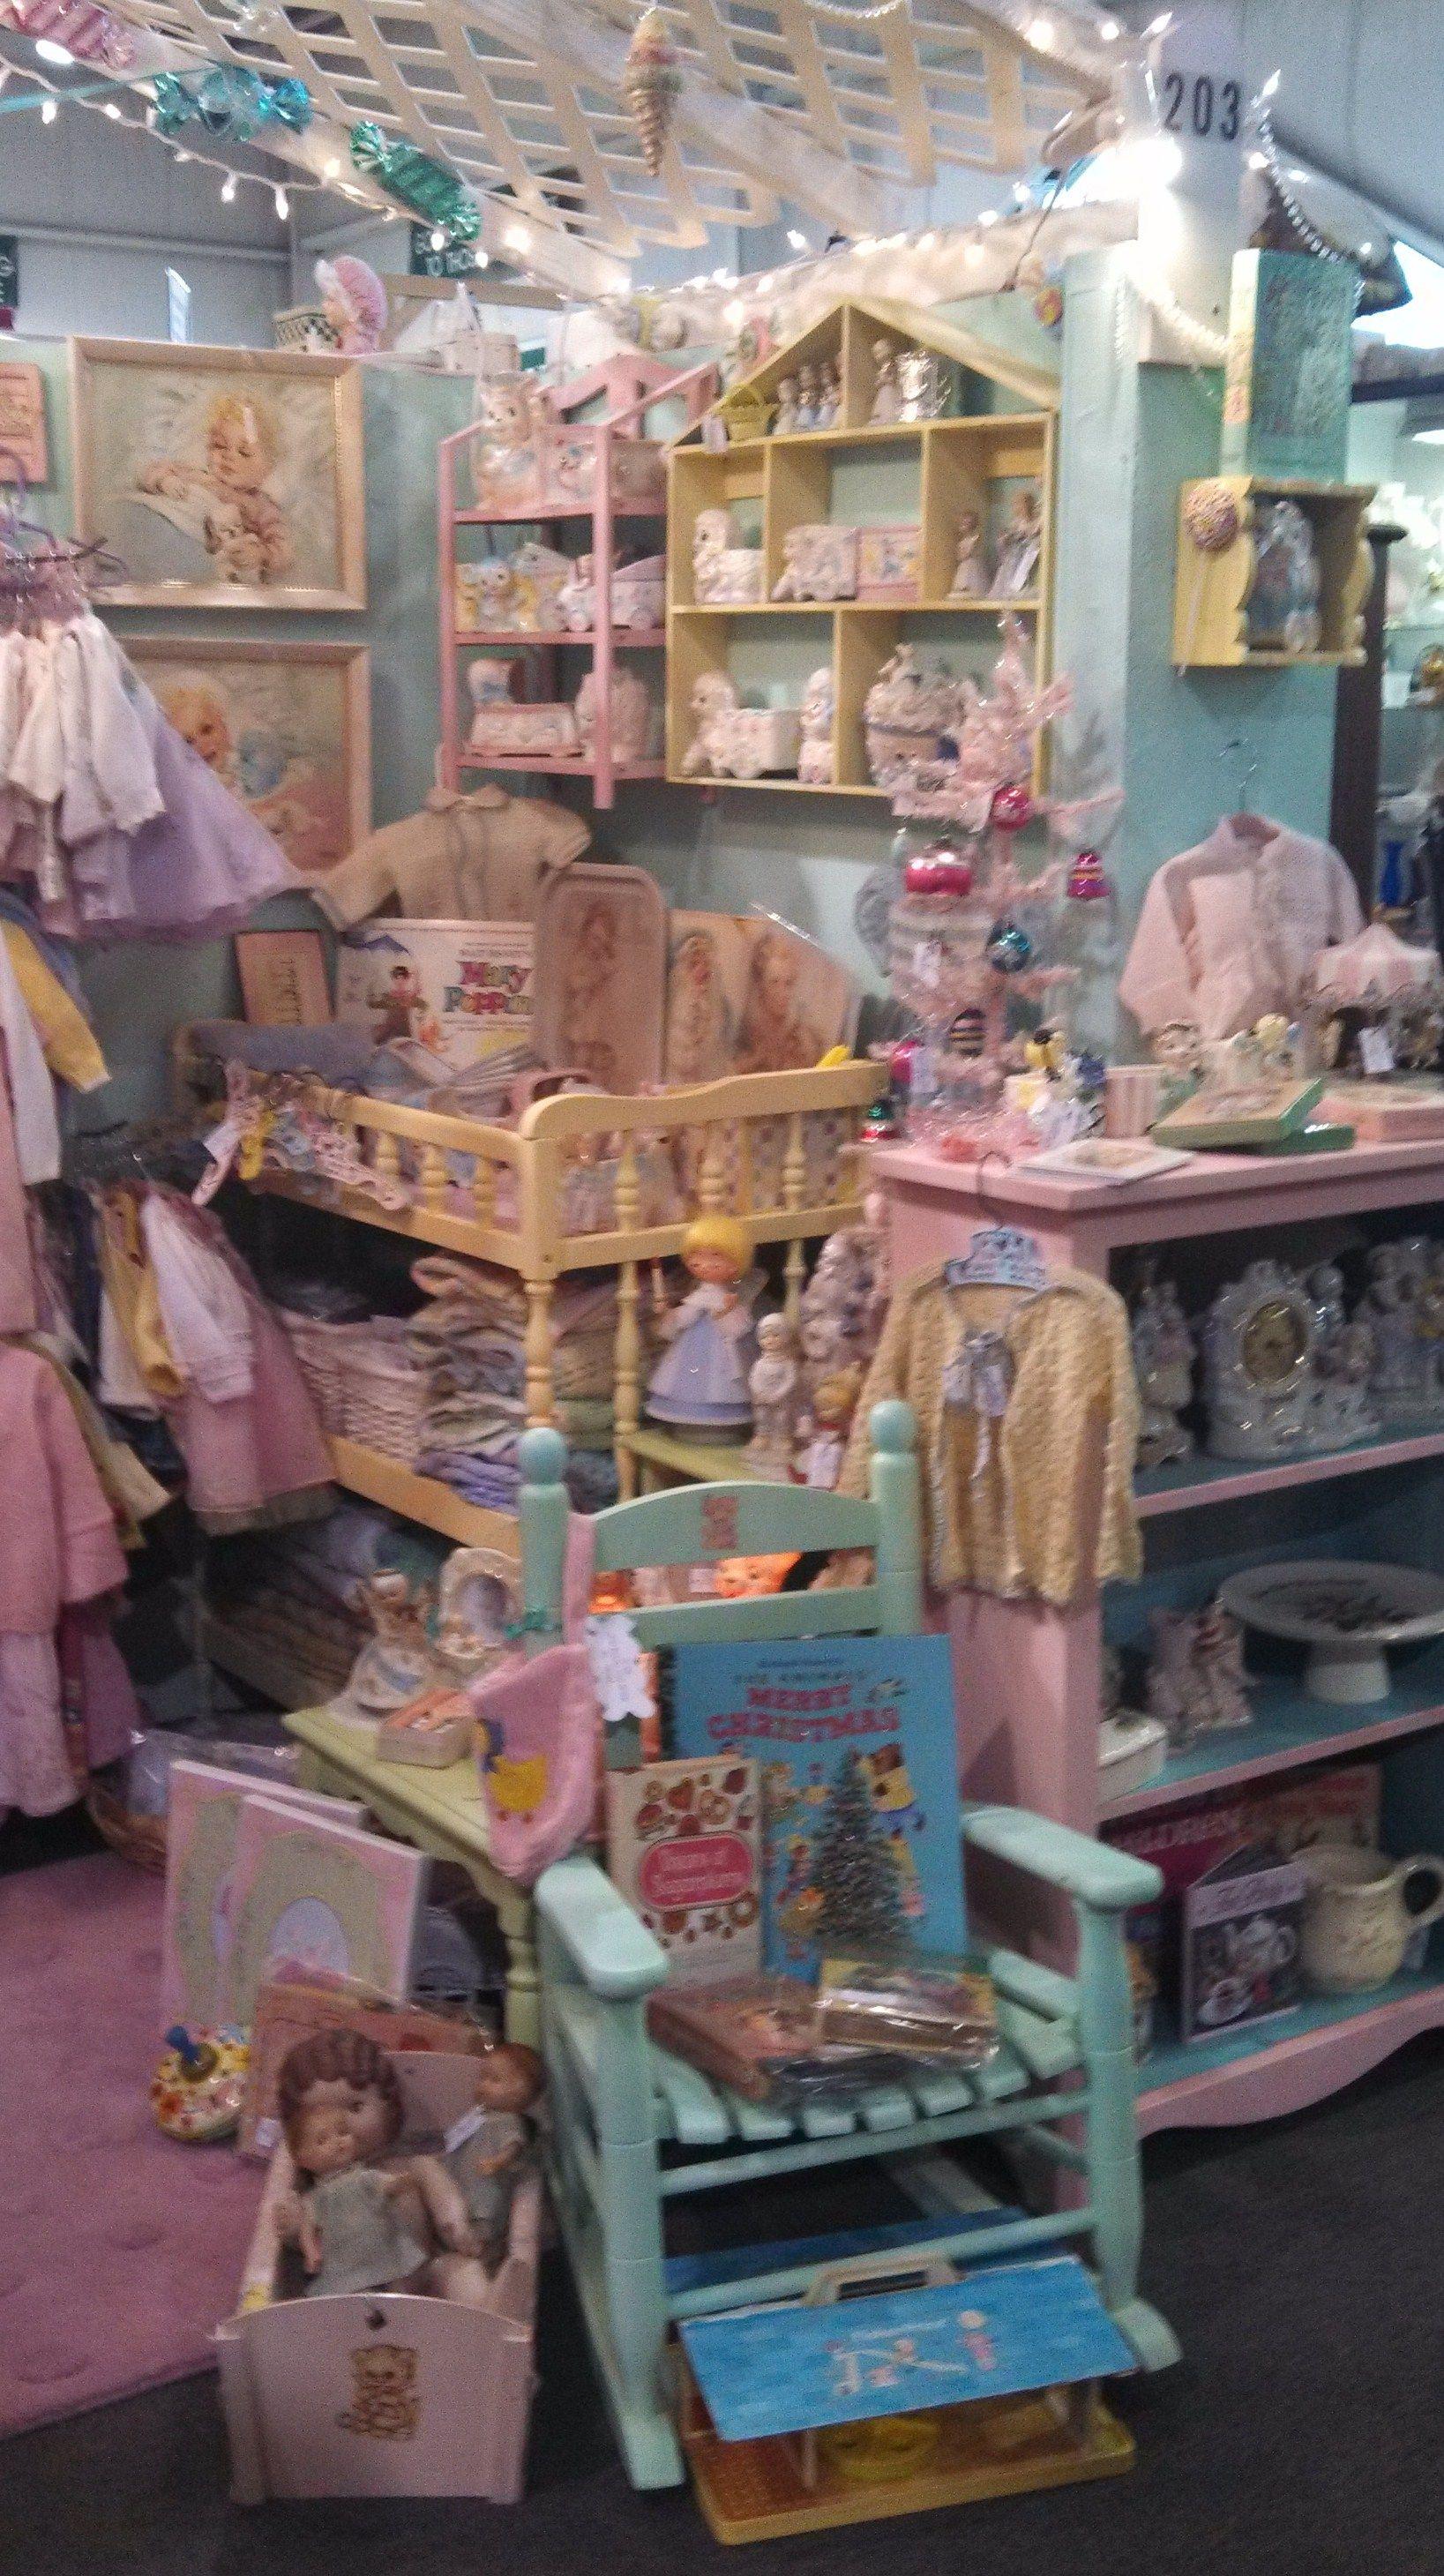 Vintage Treats Booth 203 The Brass Armadillo Omaha Store